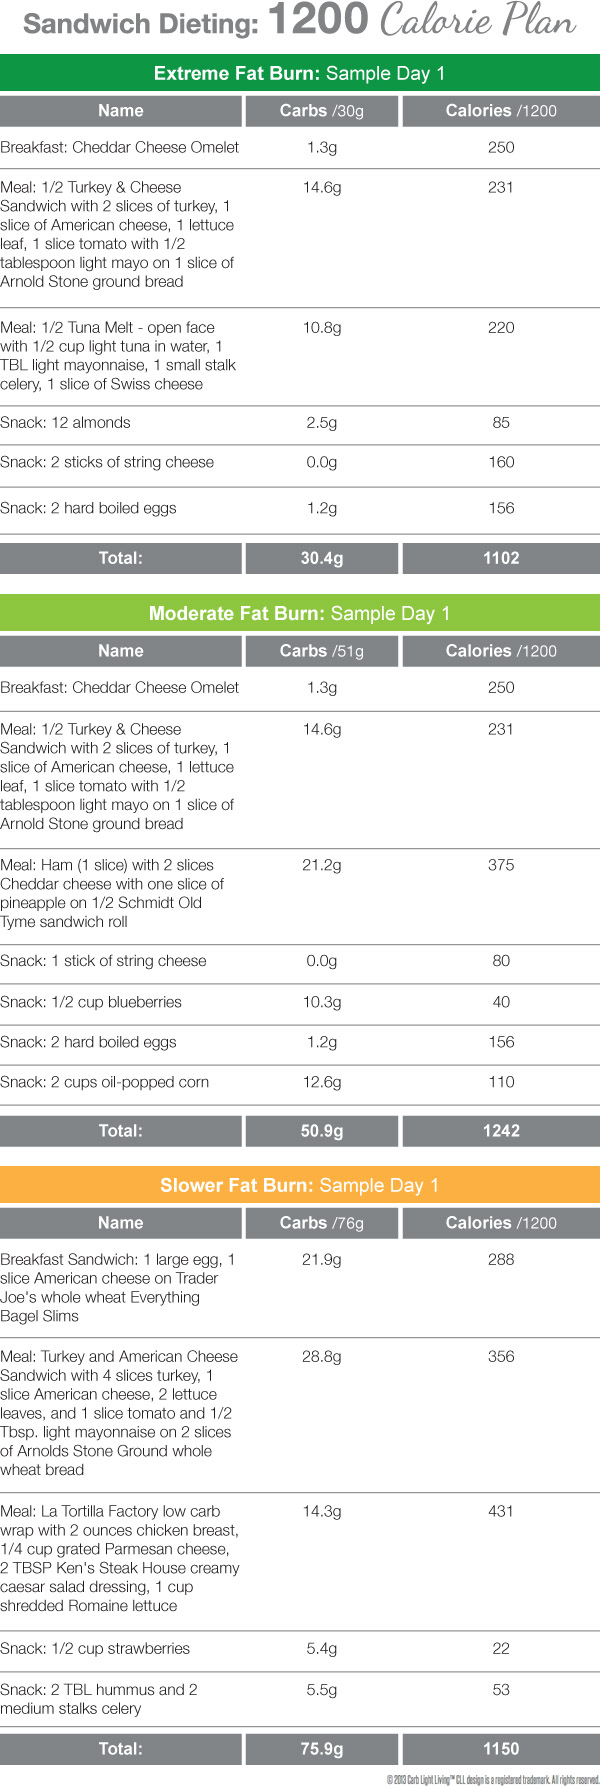 Sandwich Dieting Sample Menu 1200 Calories